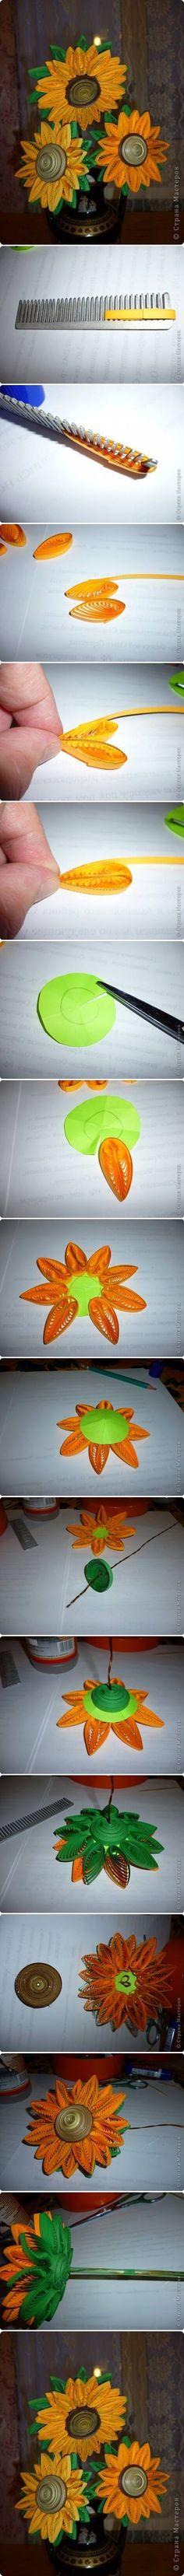 DIY Quilling Sunflower via usefuldiy.com